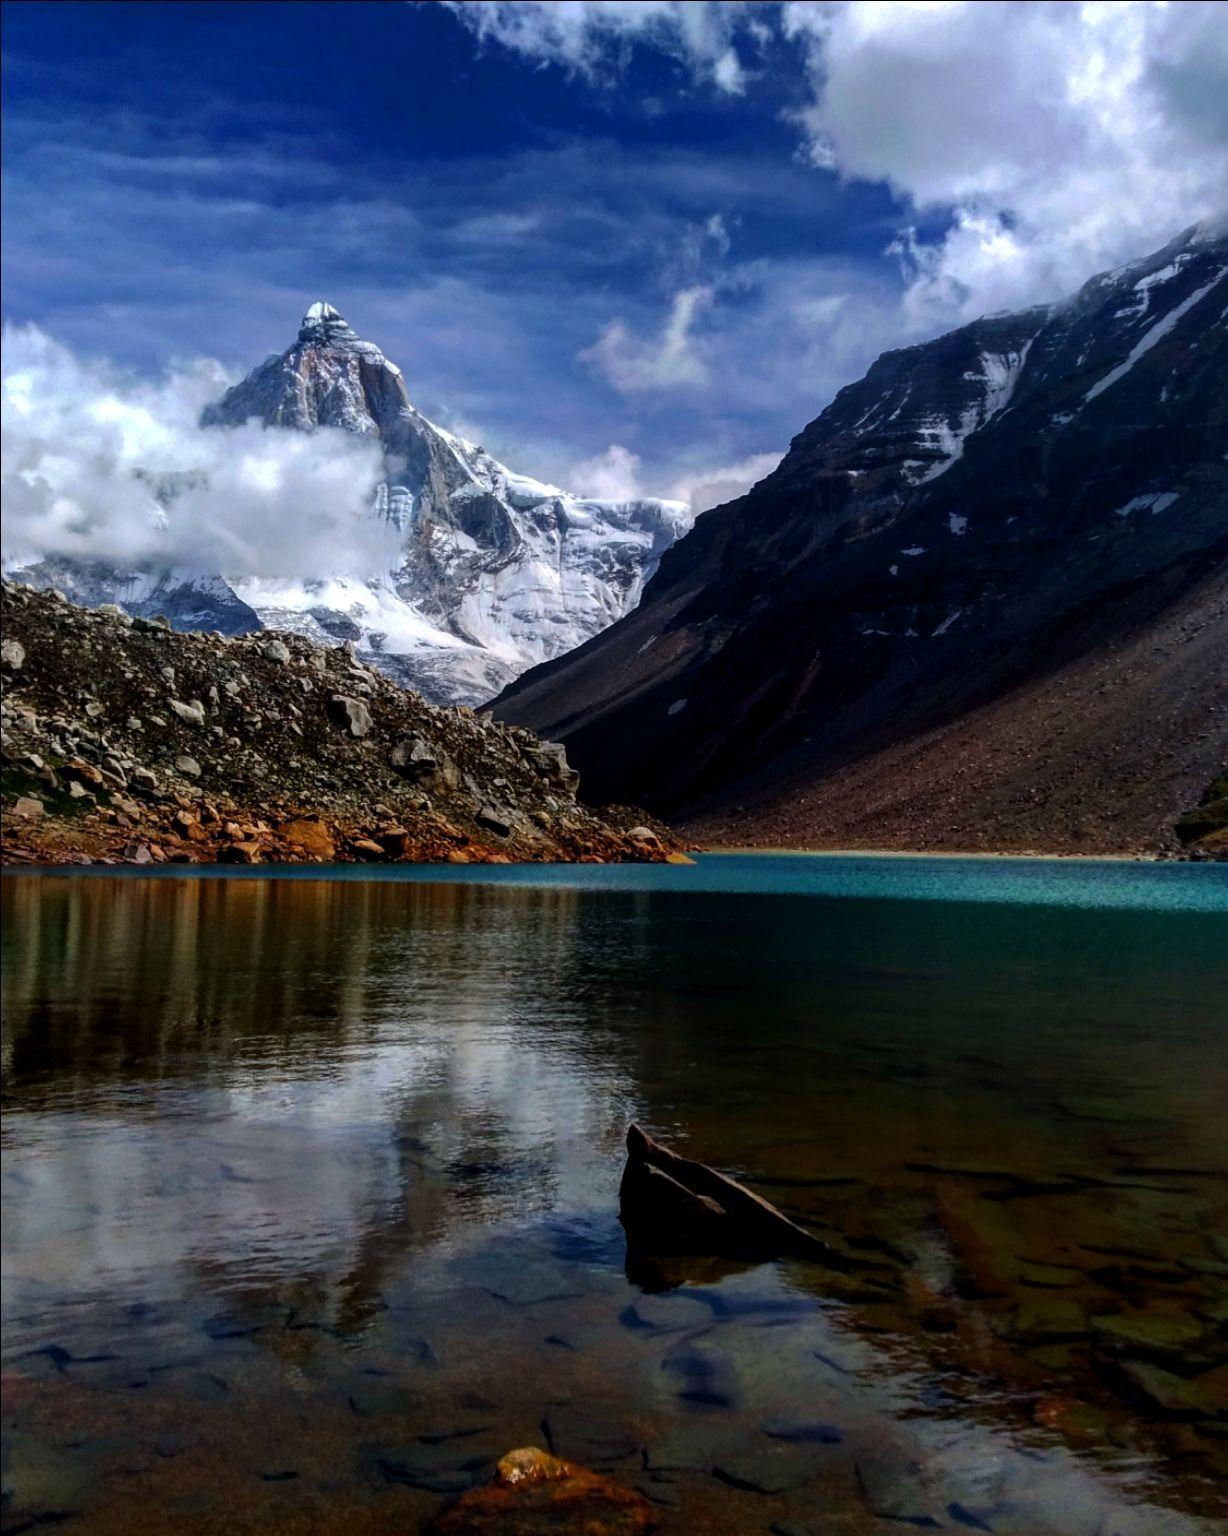 Photo of Kedartal By Mountaineer Kavi Thapa